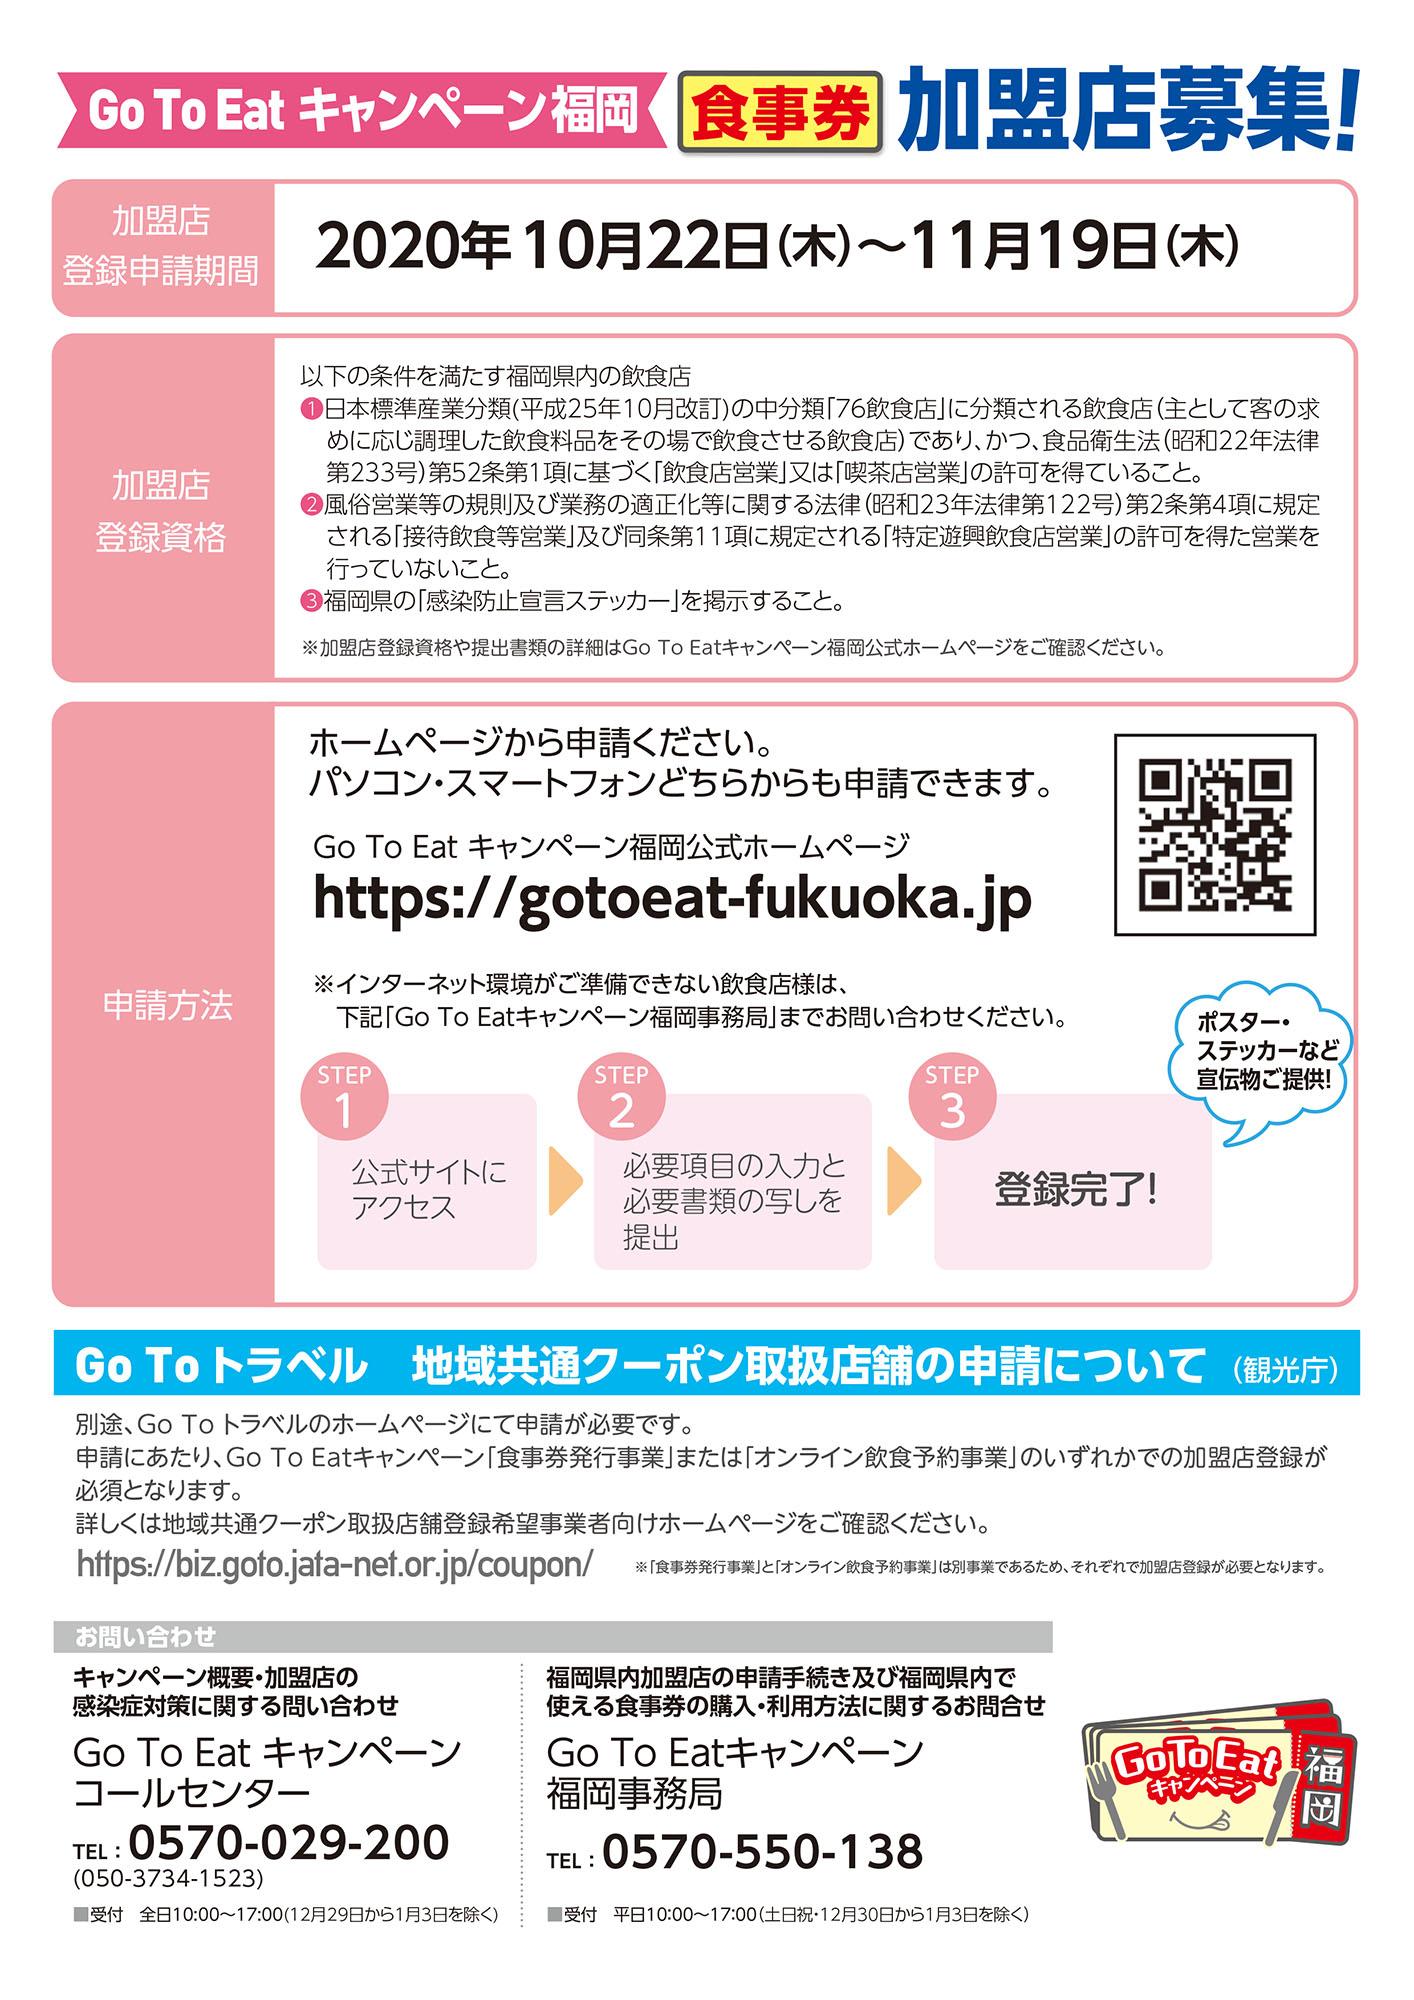 GoToEat福岡_加盟店チラシ表